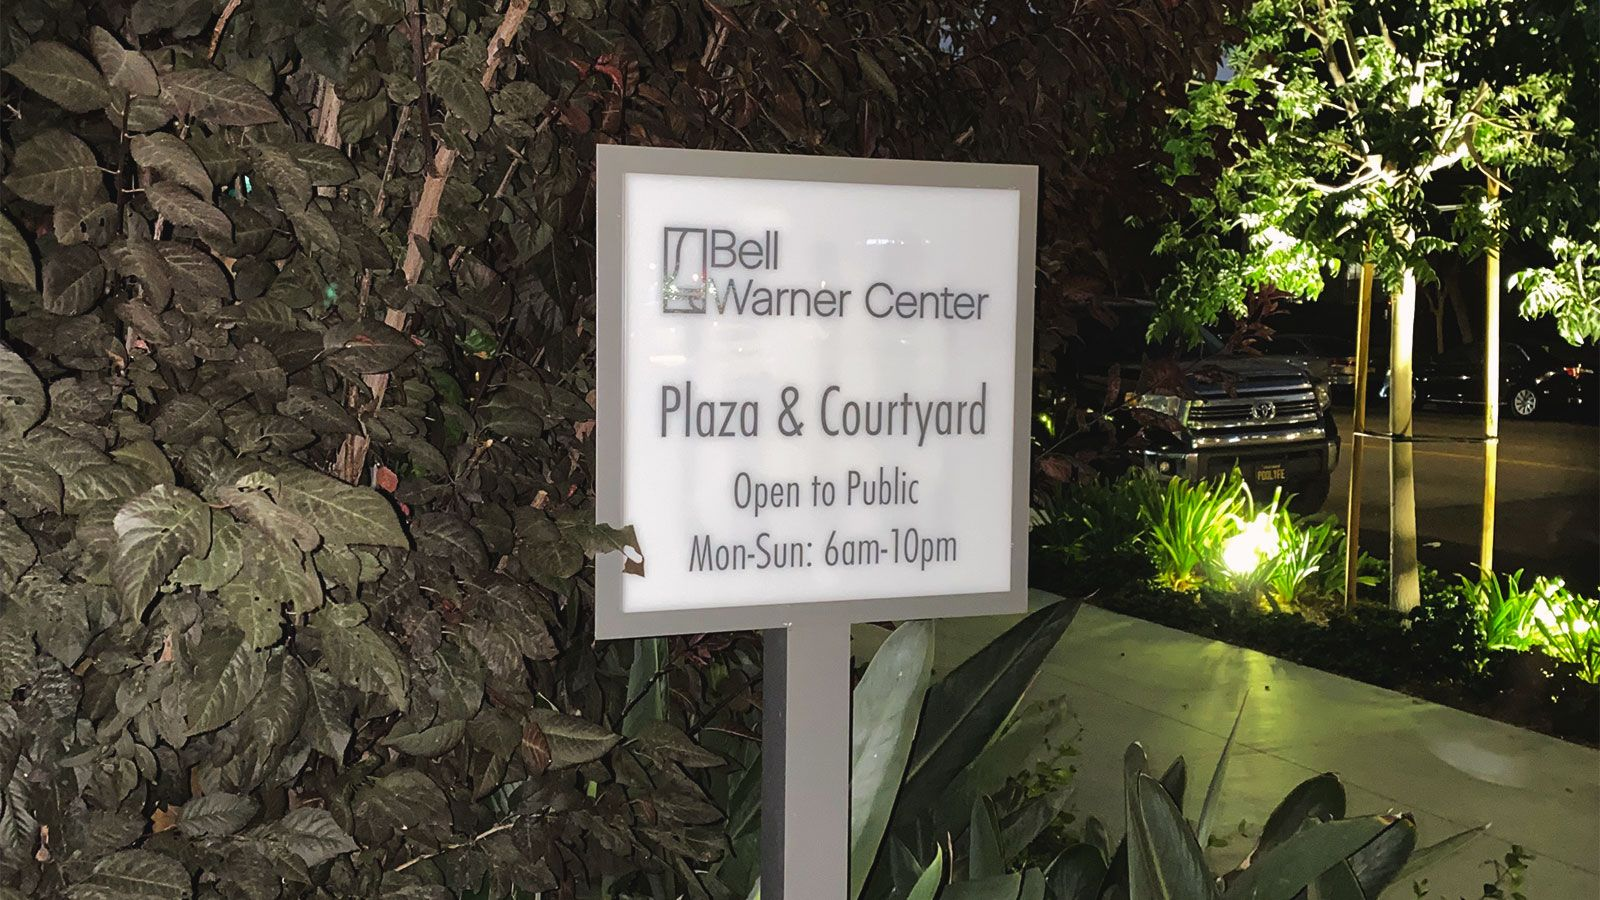 Bell warner center acrylic sign